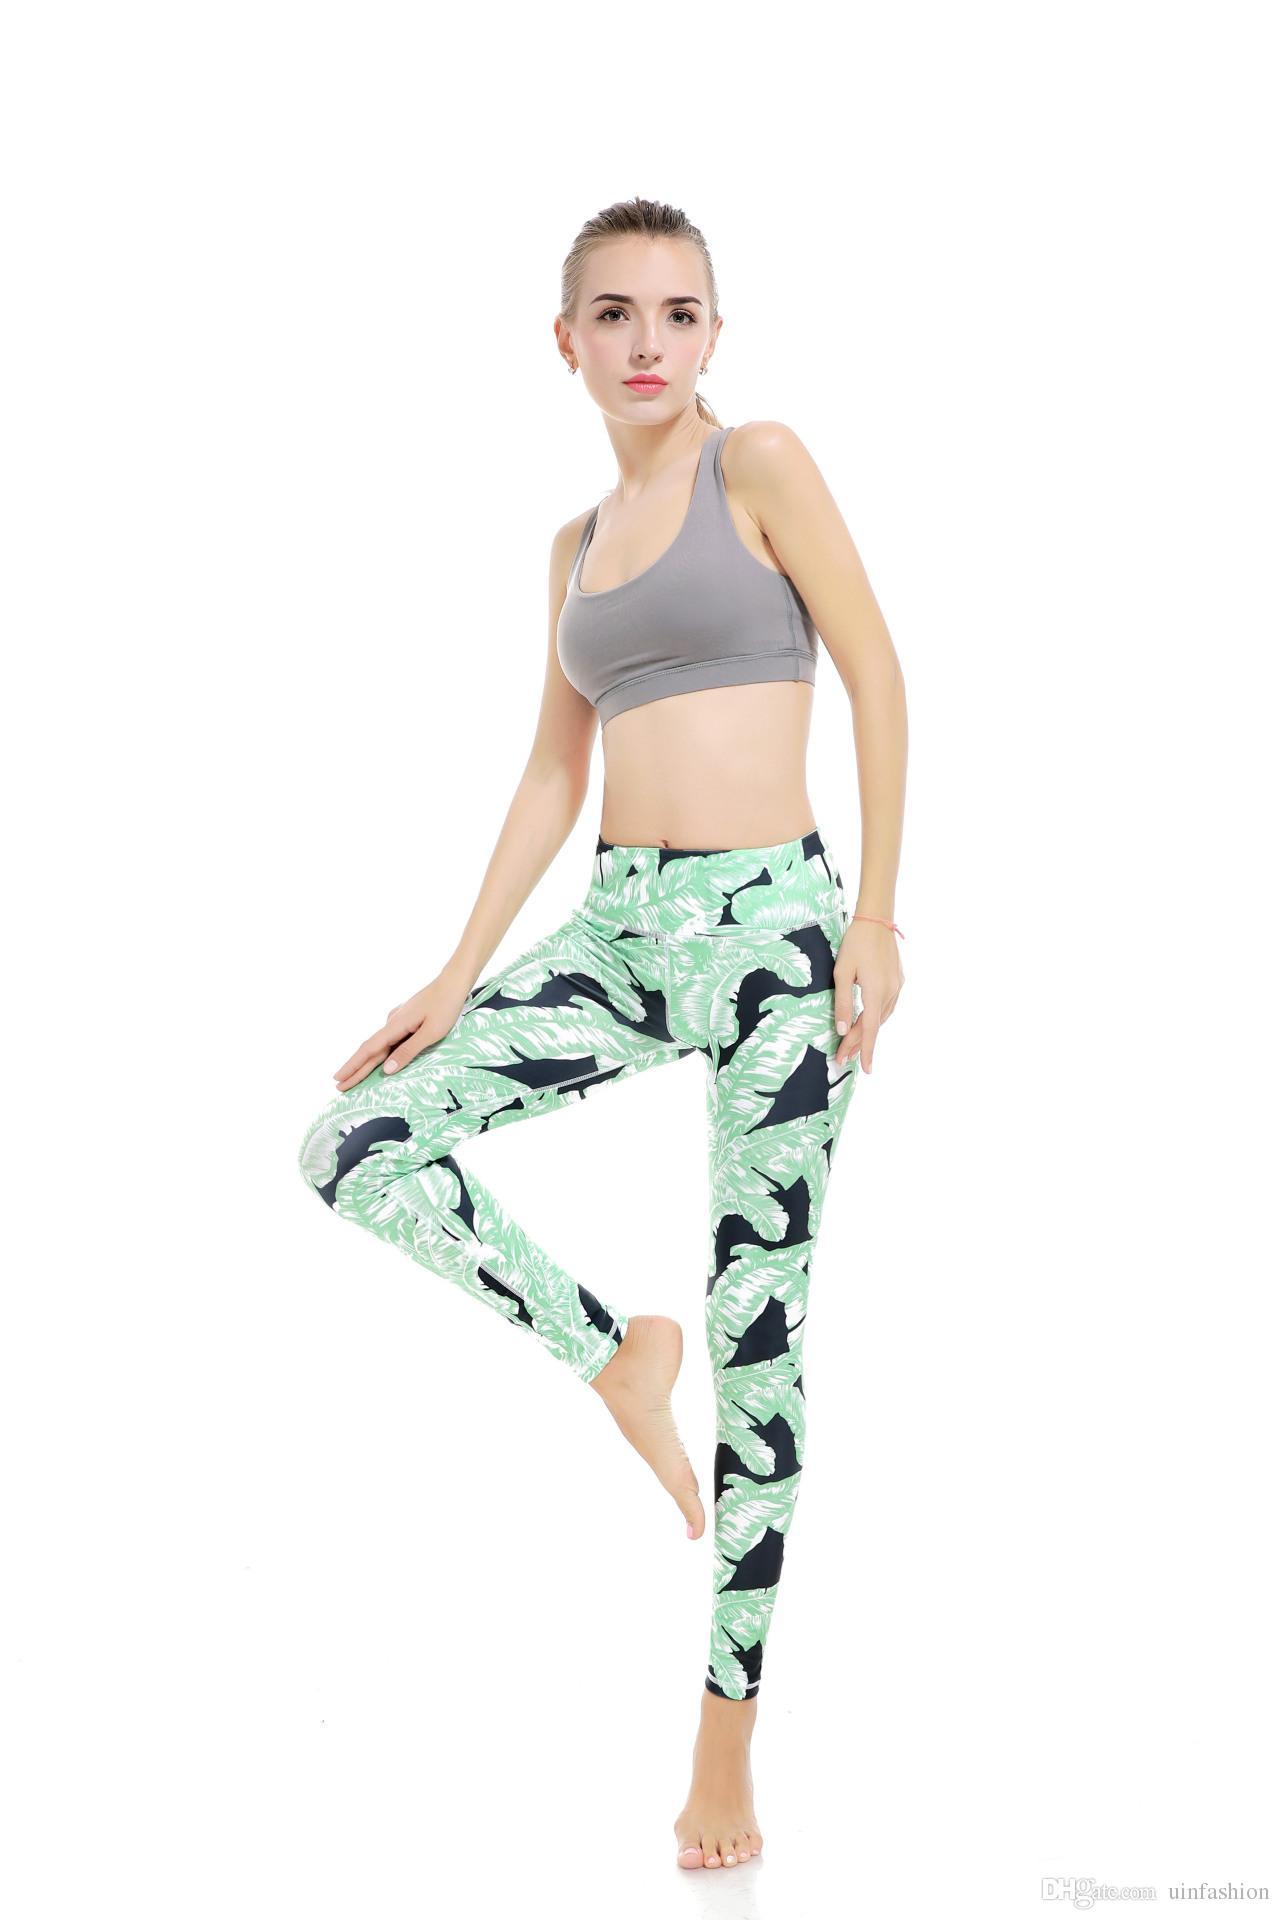 Fitness Yoga Pants Women Leggings Floral Workout Sports Running Leggings Sexy Push Up Gym Training Wear Elastic Slim Pants